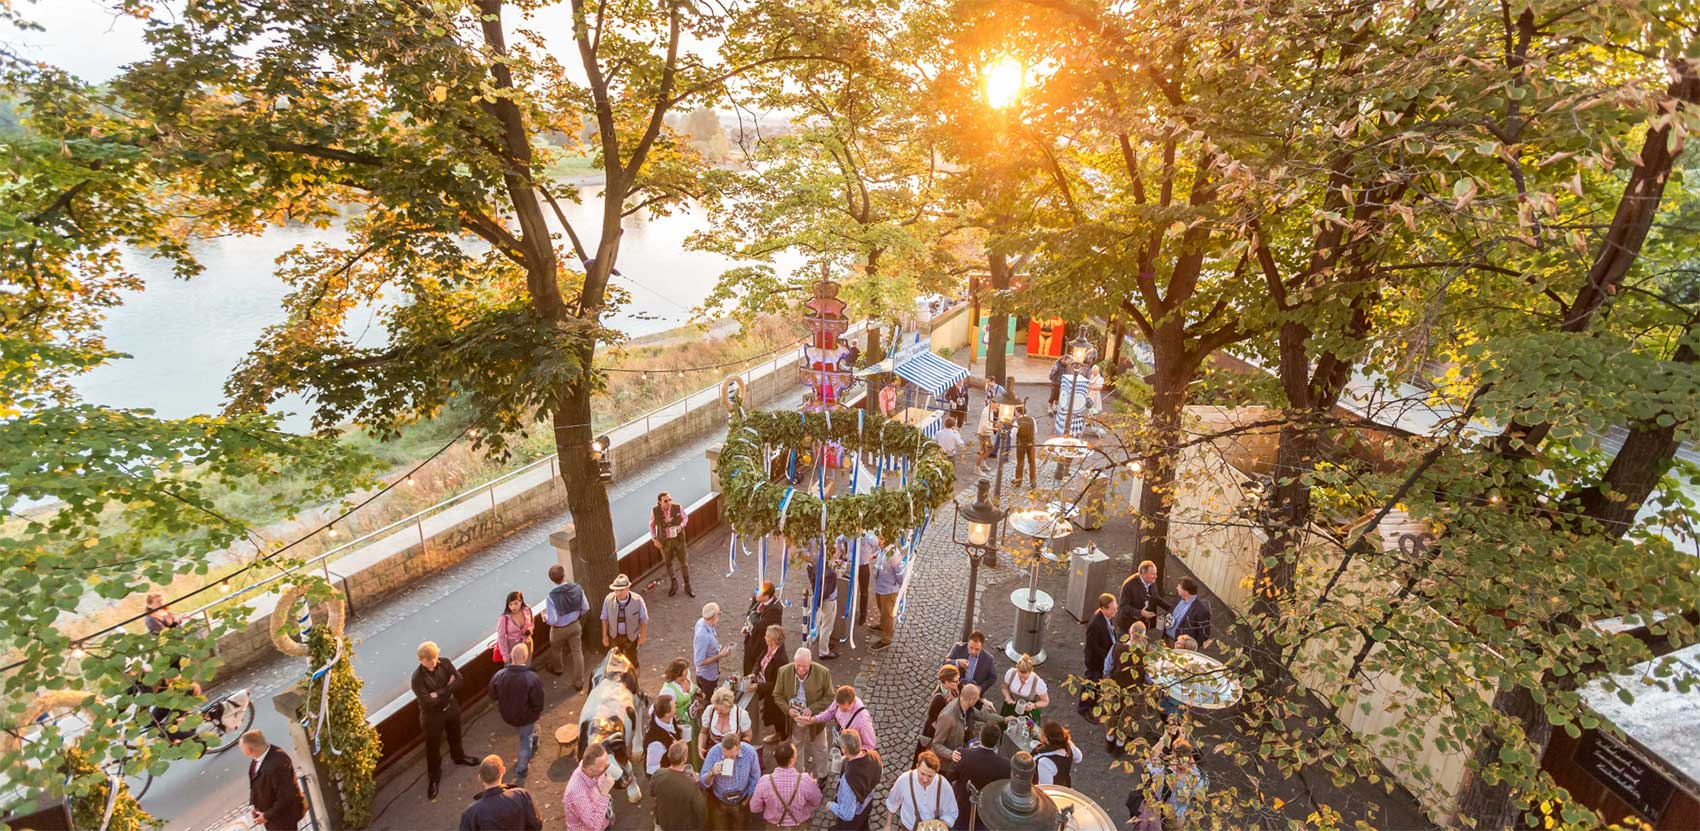 lange_und_soehne_dealer_conference_intro_oktoberfest